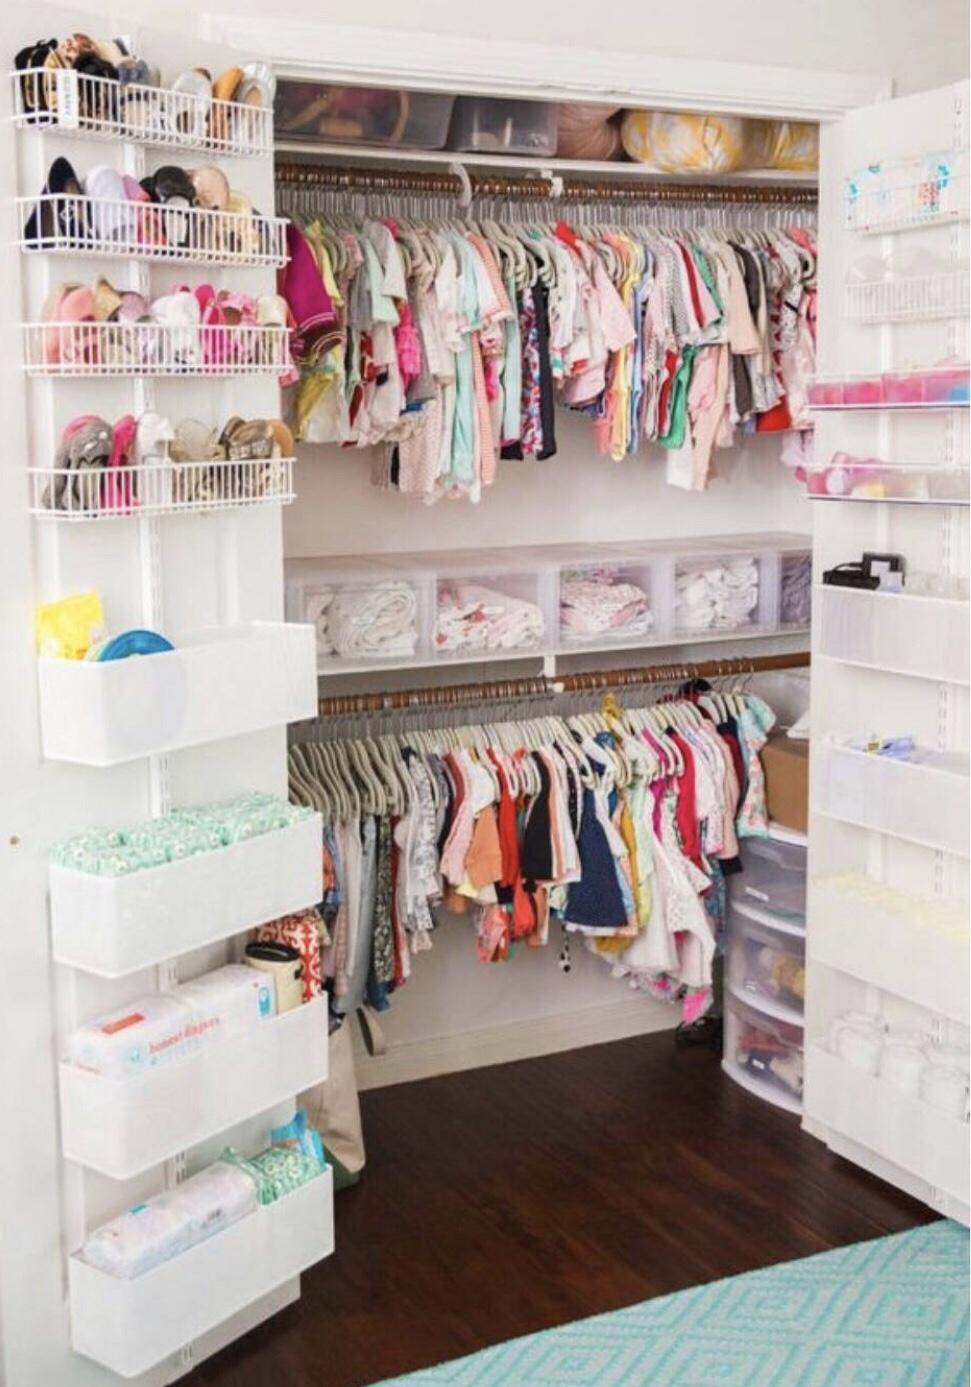 storage behind doors-nursery organisation nursery organization